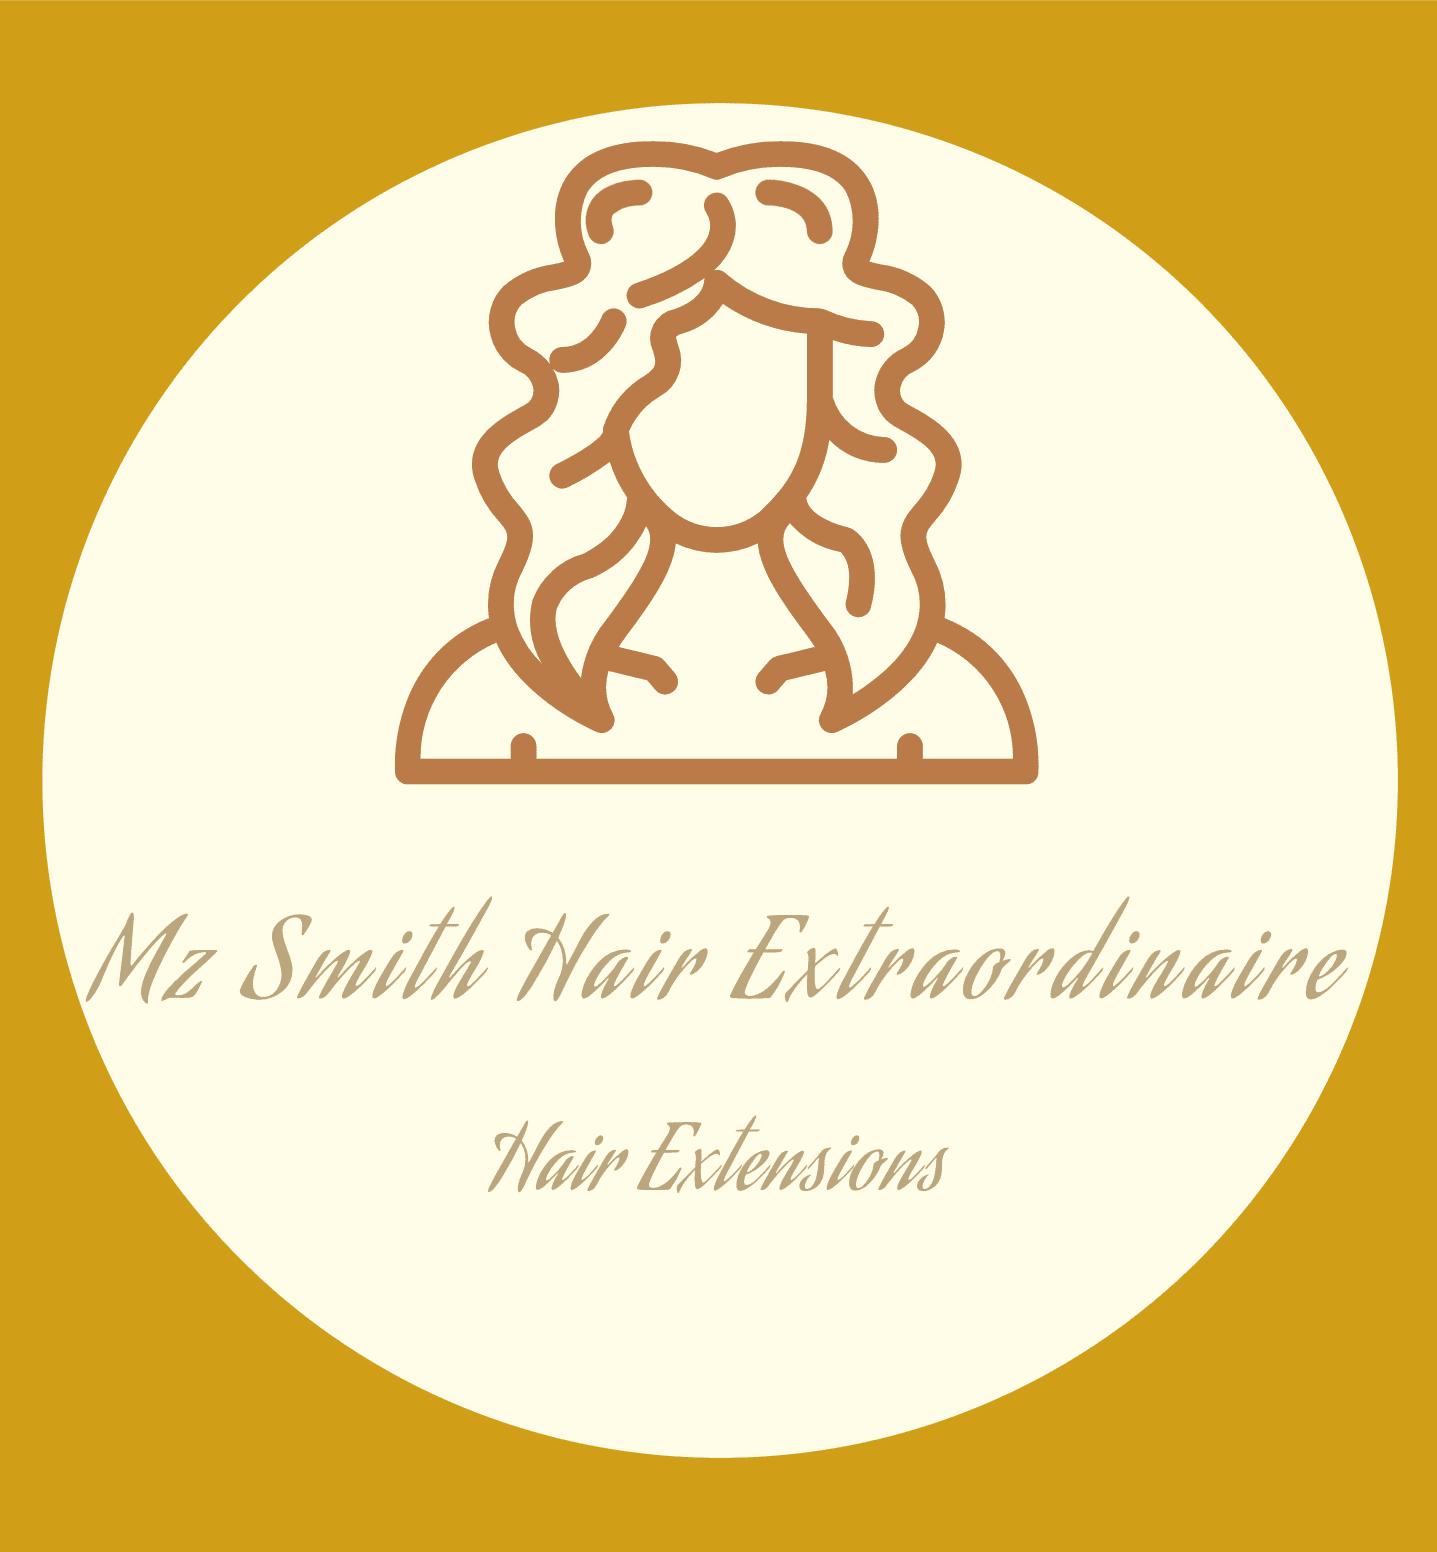 Mz Smith Hair Extraordinaire